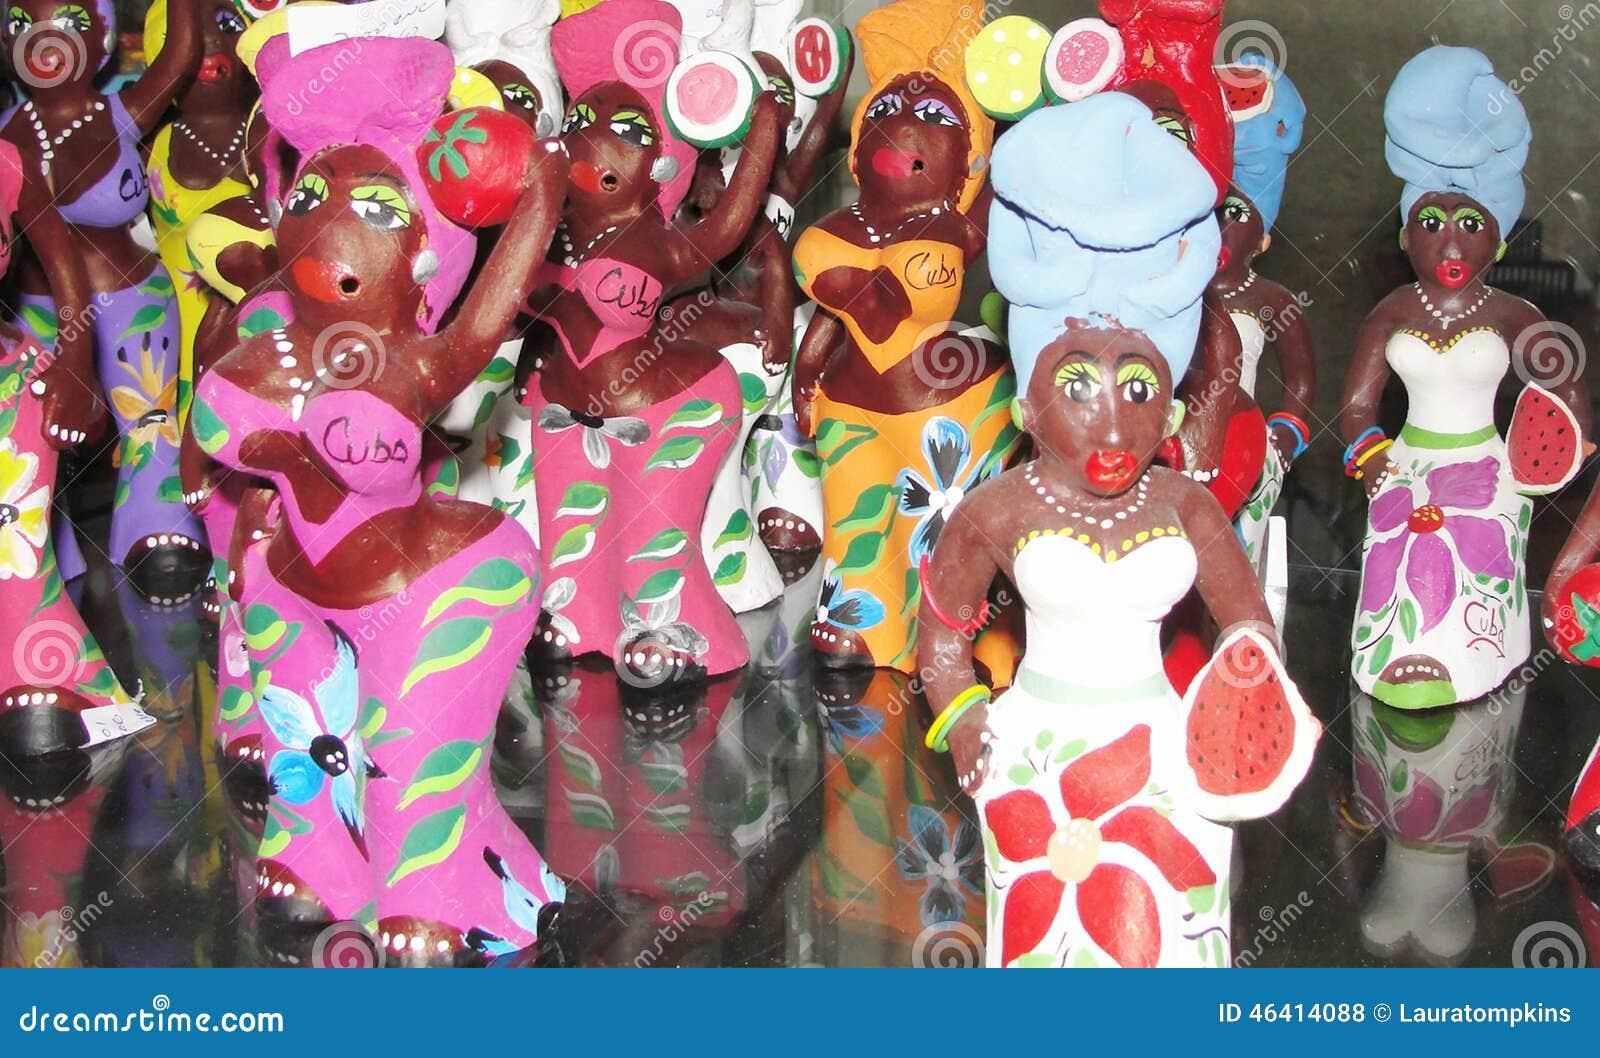 Download Cuba Street Market Dolls stock photo. Image of display - 46414088